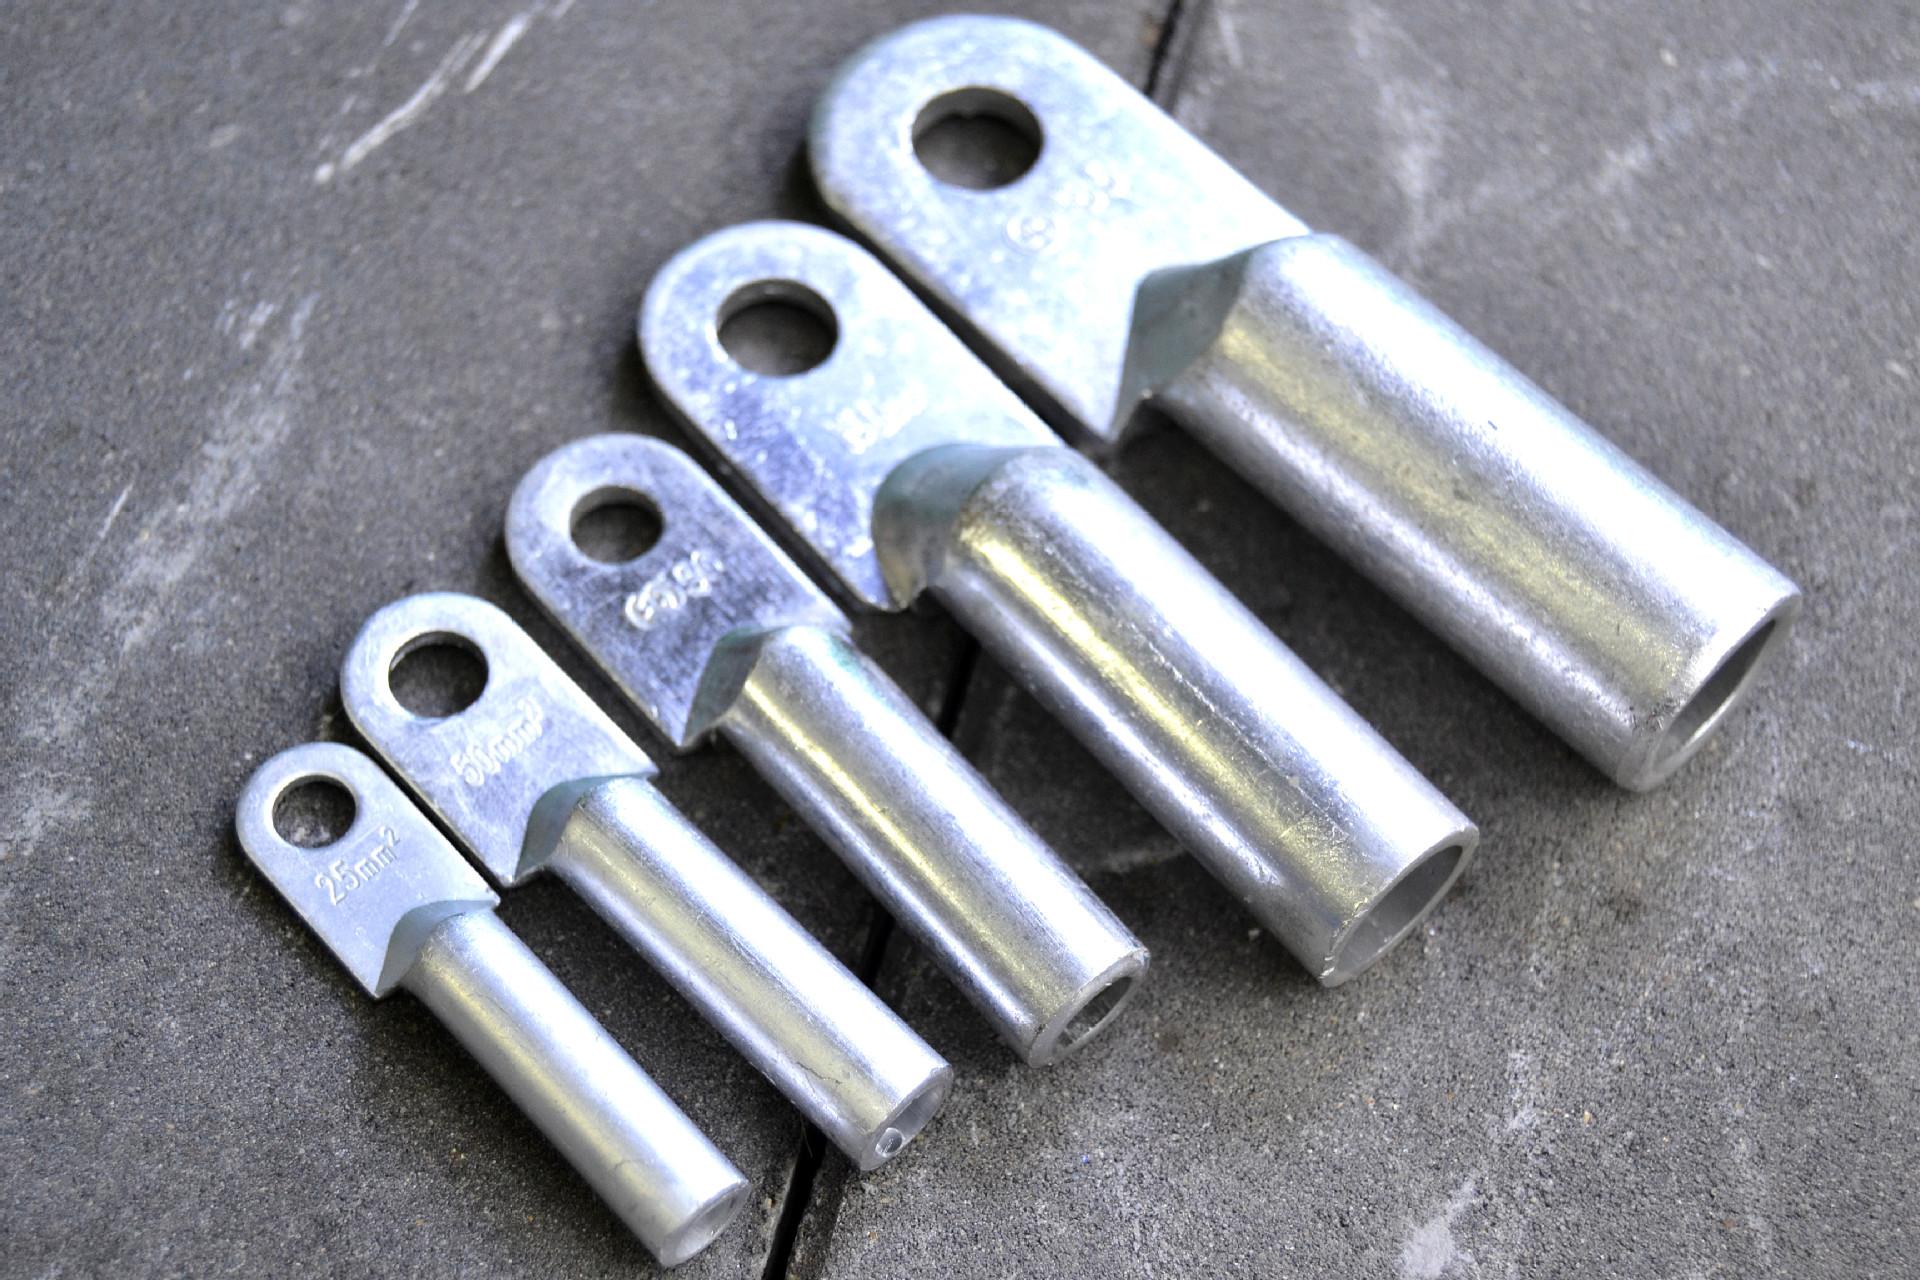 dl鋁線鼻子 鋁接線鼻子 冷壓鋁端子 鋁線耳